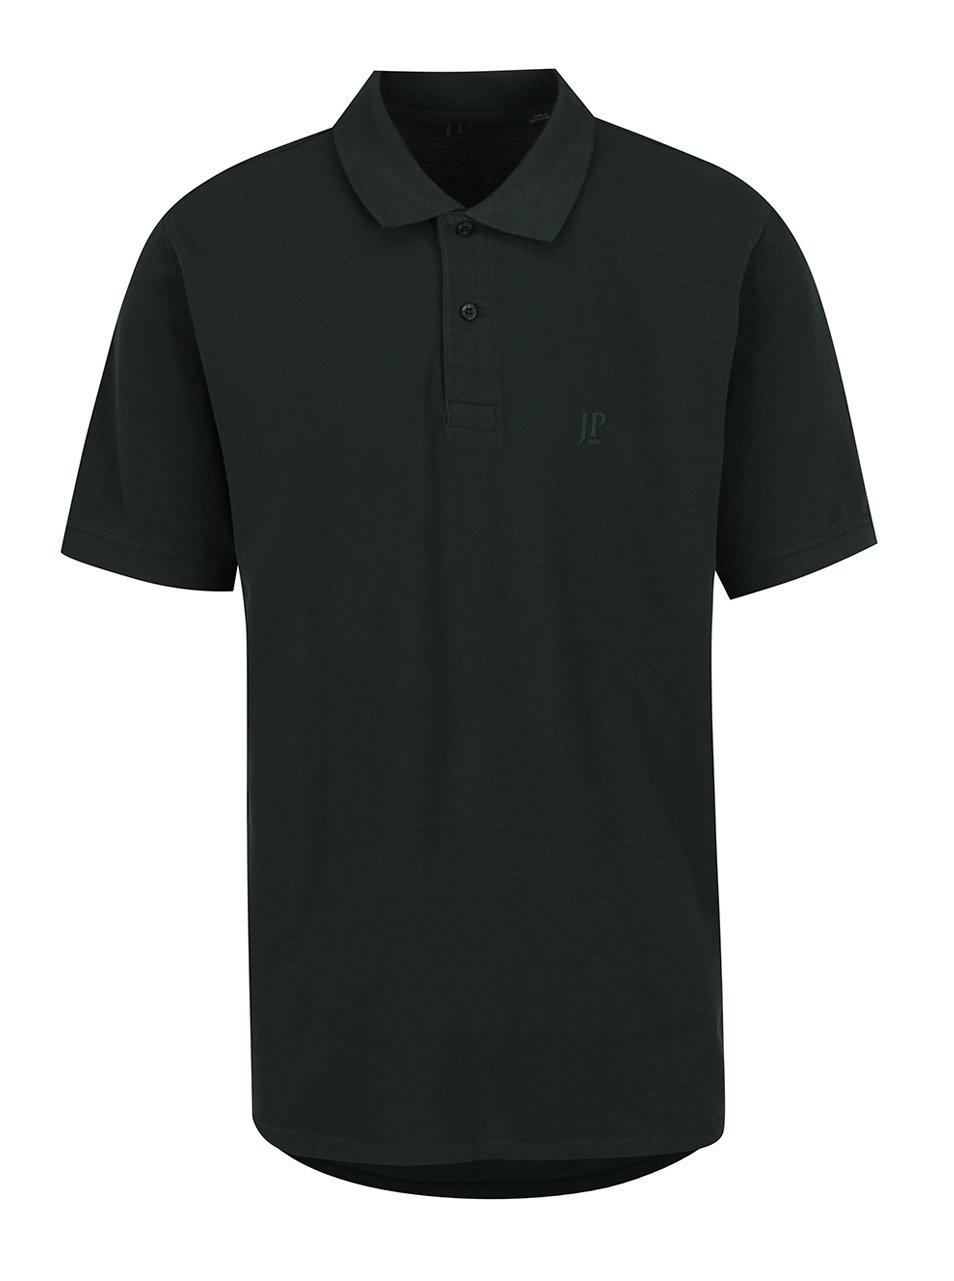 Tmavě zelené polo tričko JP 1880